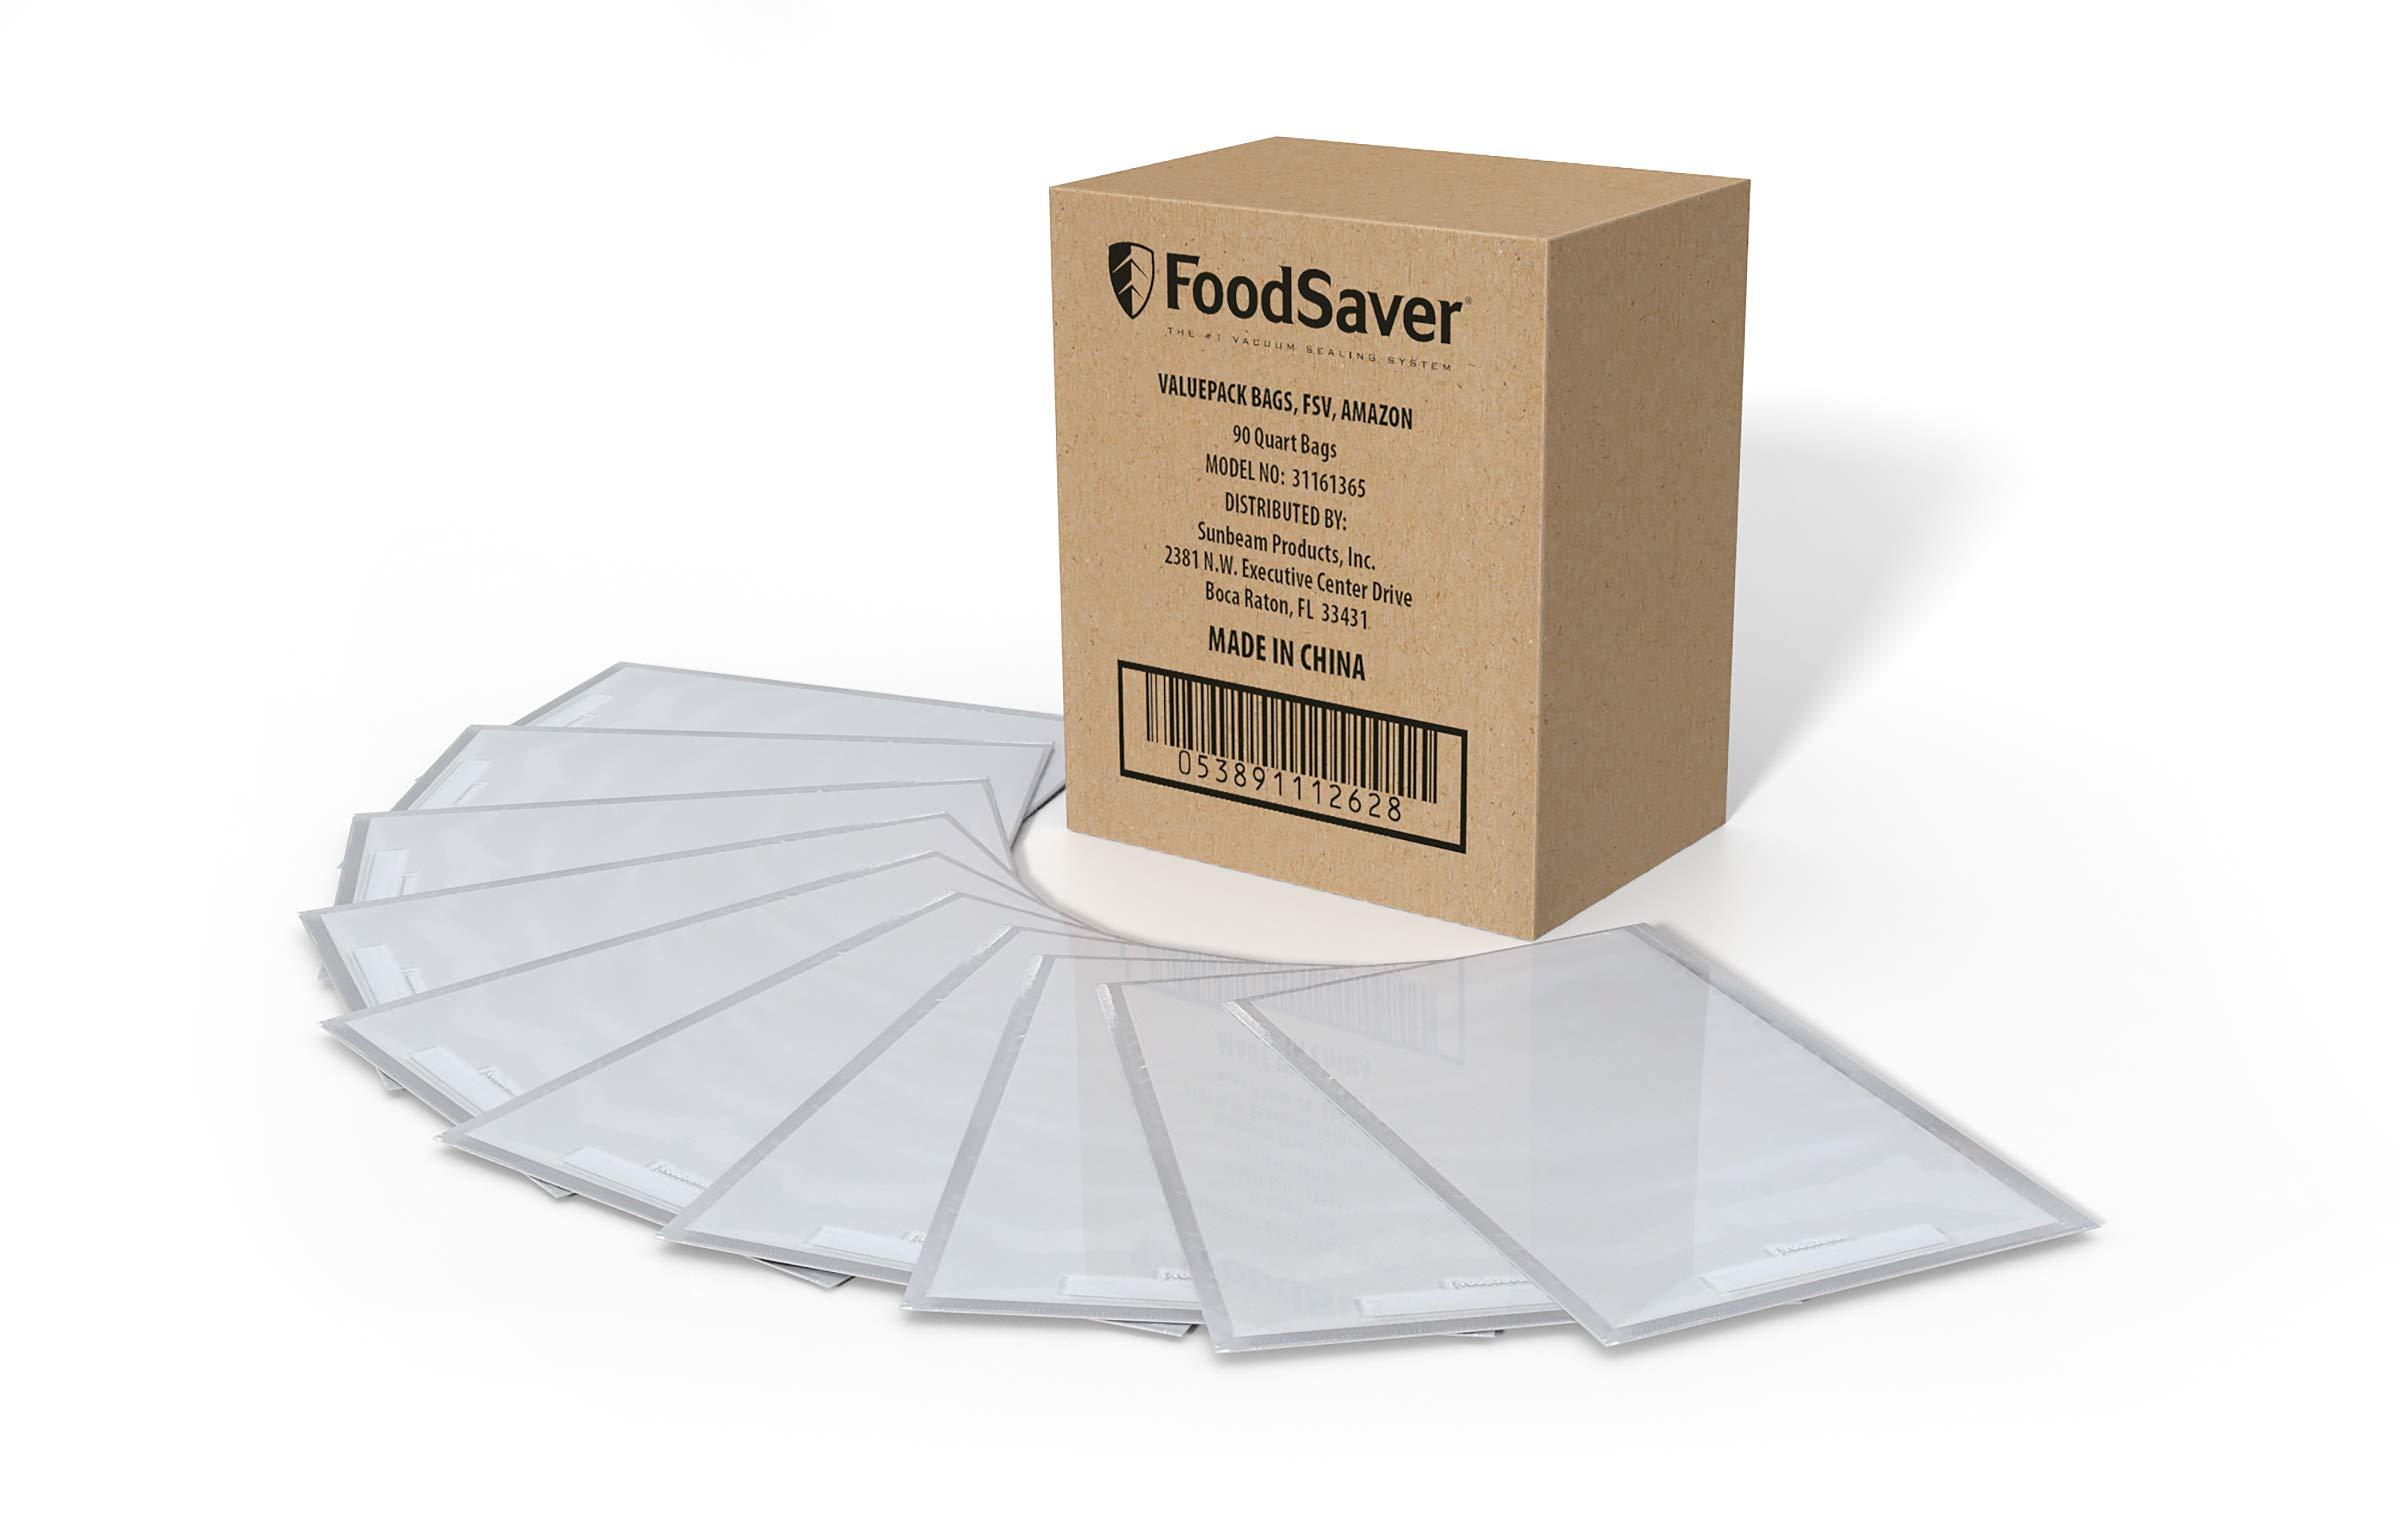 FoodSaver 1-Quart Vacuum Sealer, Bags, 90 Count | BPA-Free, Commercial Grade for Food Storage and Sous Vide by FoodSaver